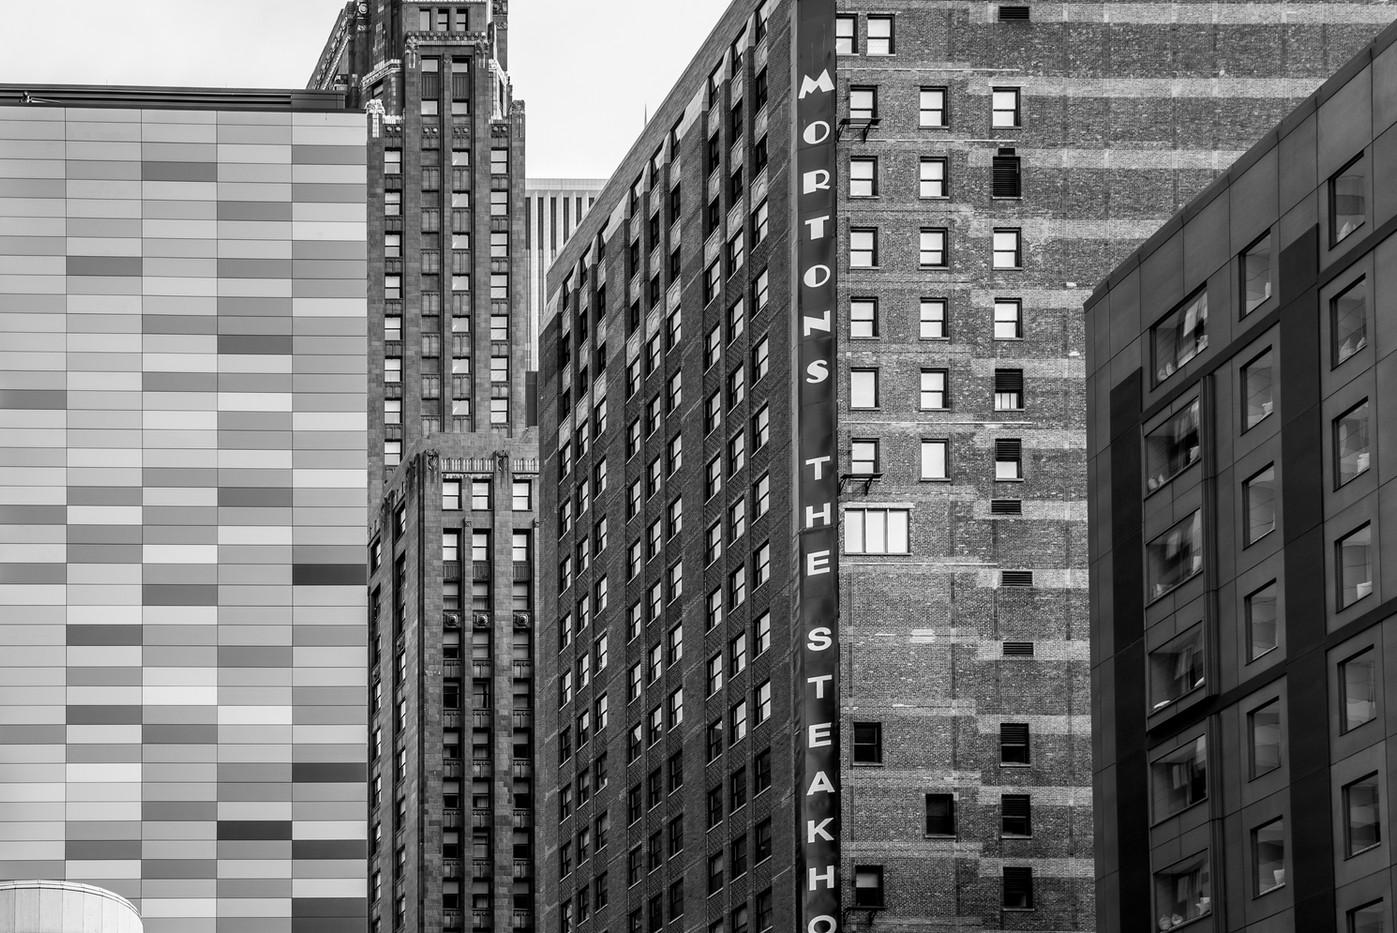 Archistructures #11